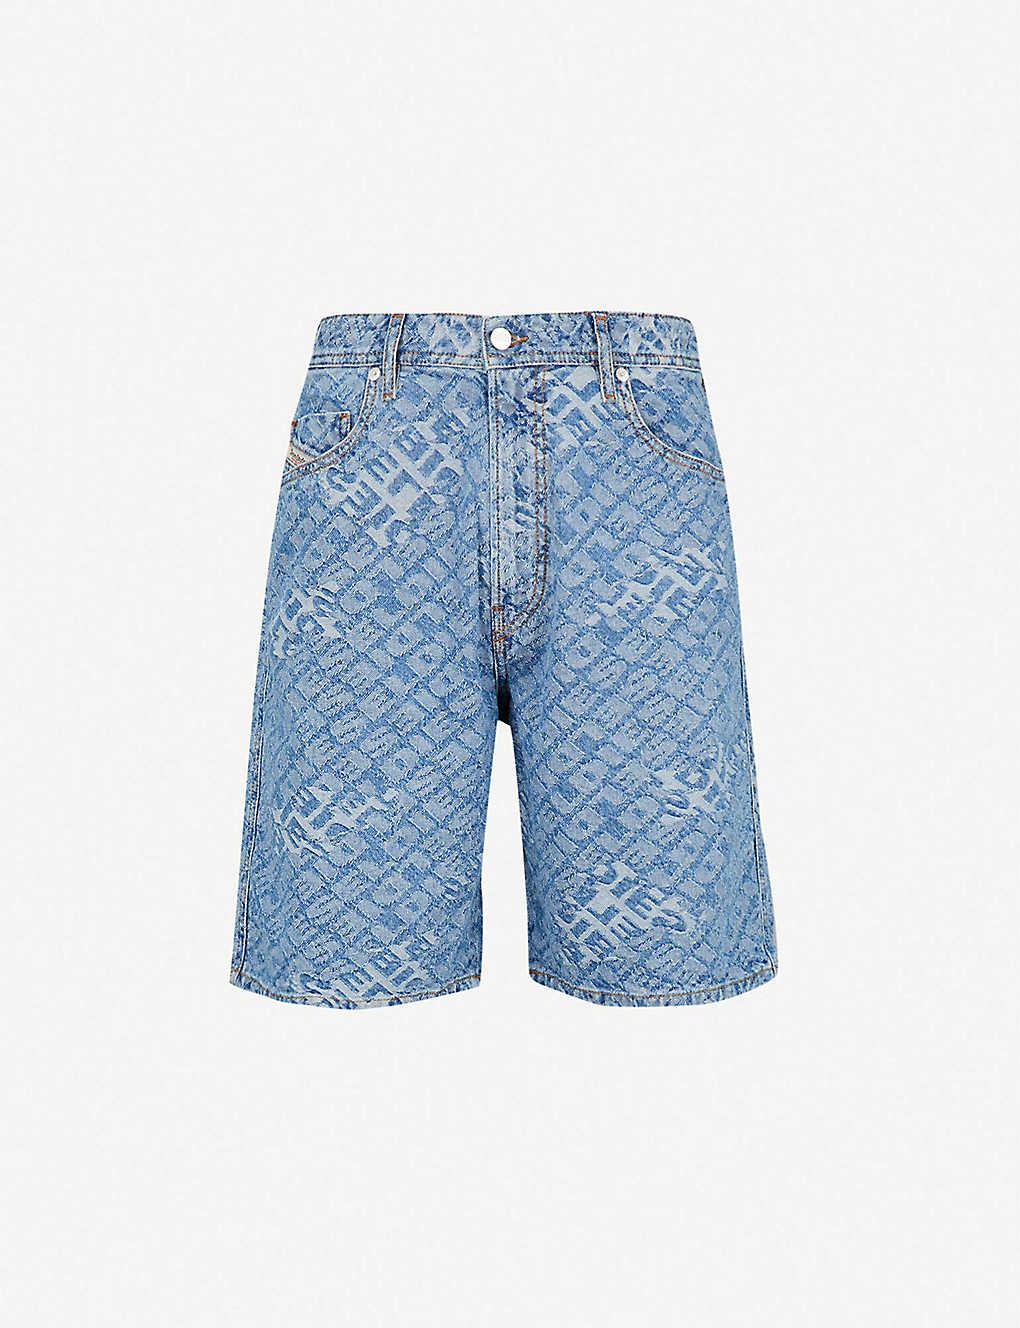 40c2316f568 DIESEL - D-Willoh logo-jacquard denim shorts | Selfridges.com